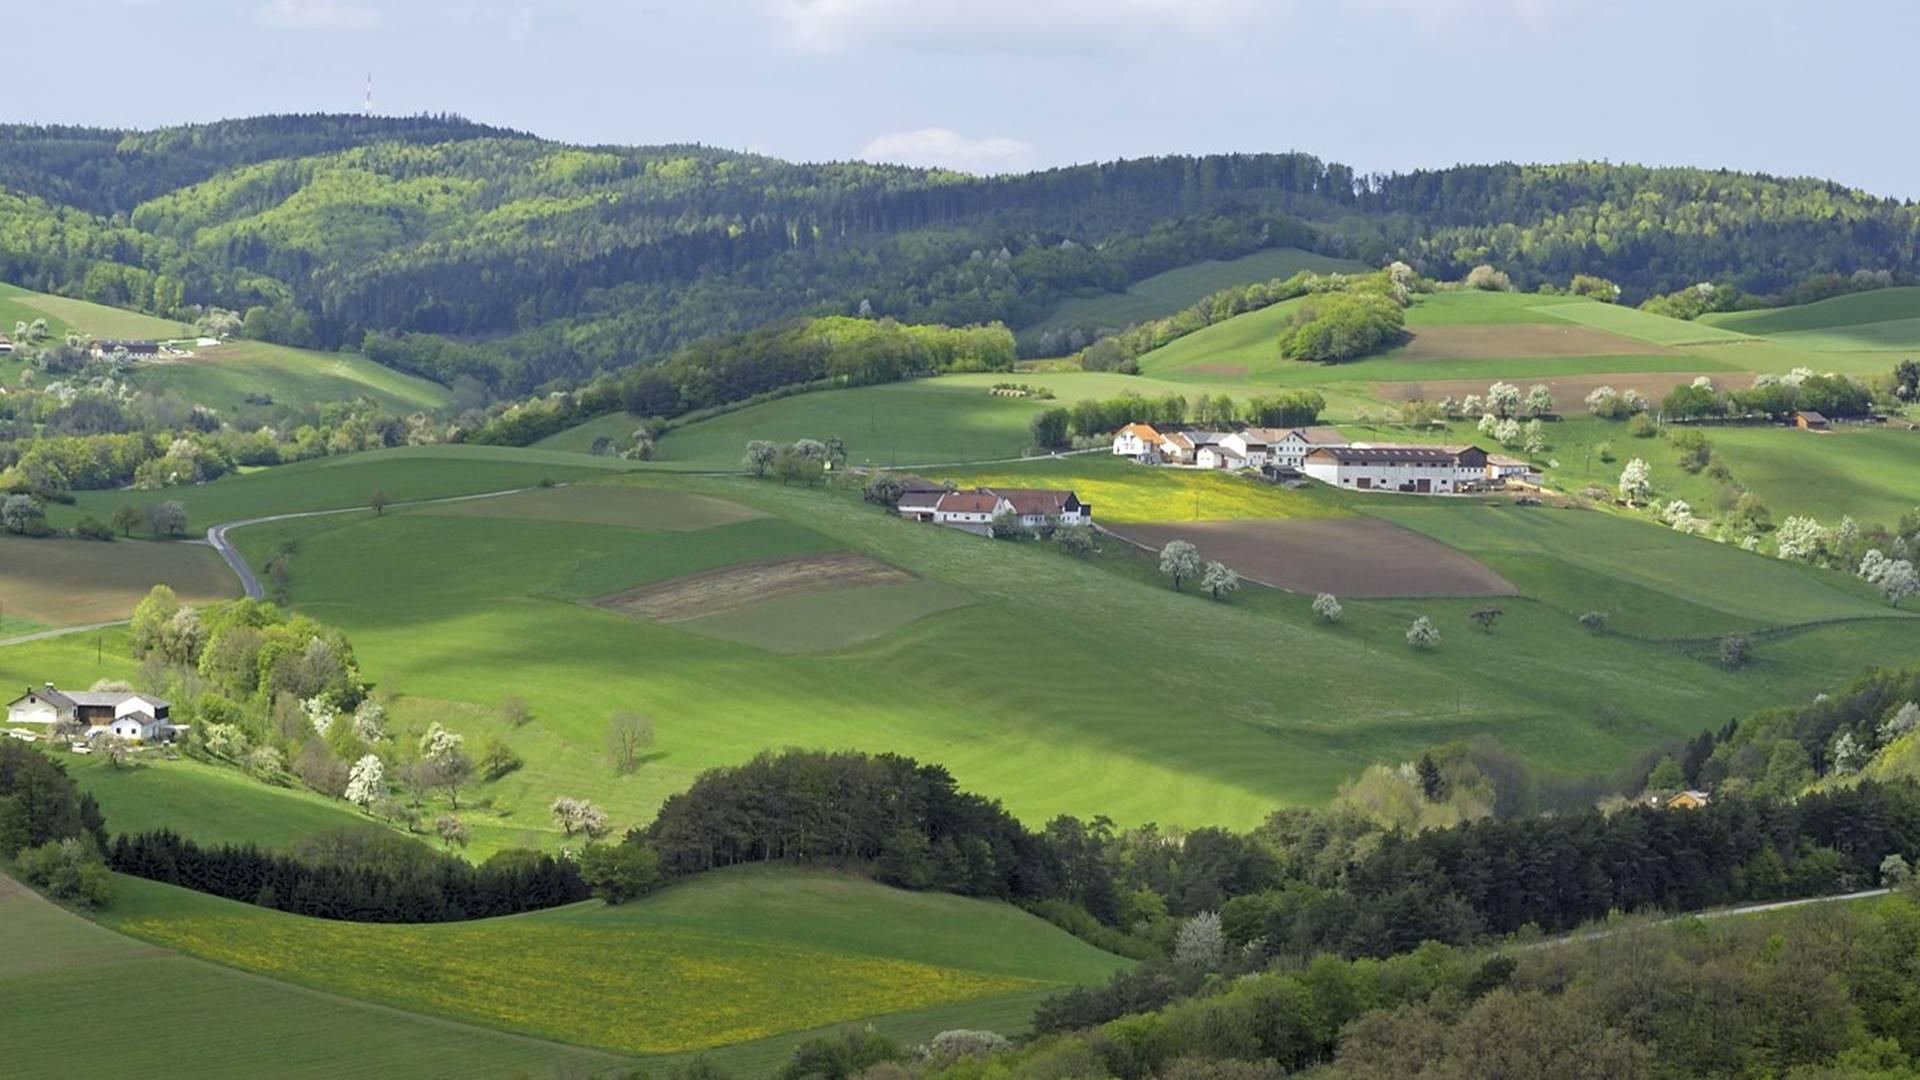 landseer-berge-naturpark